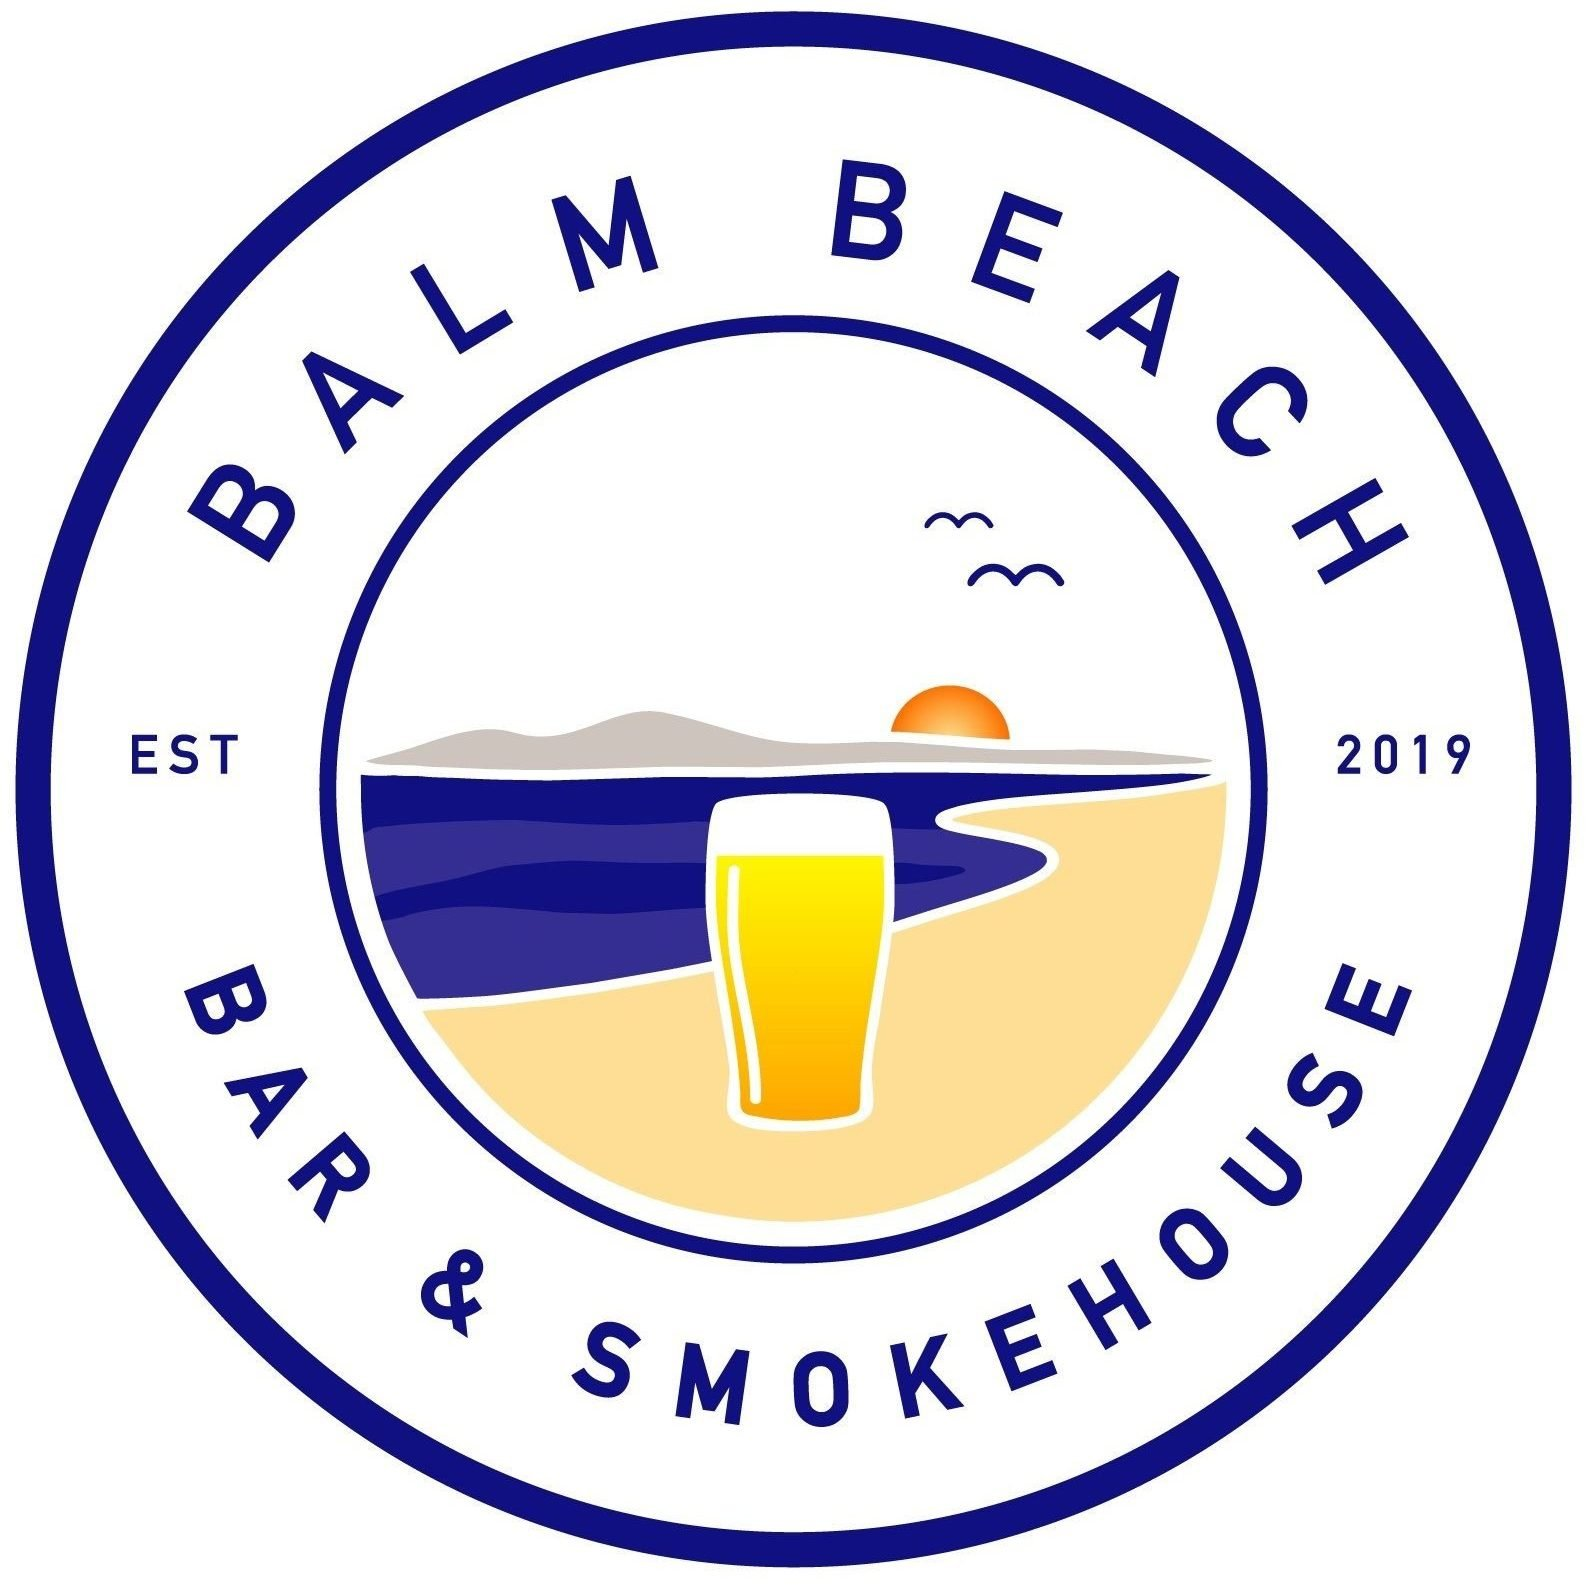 Balm Beach Bar & Smokehouse